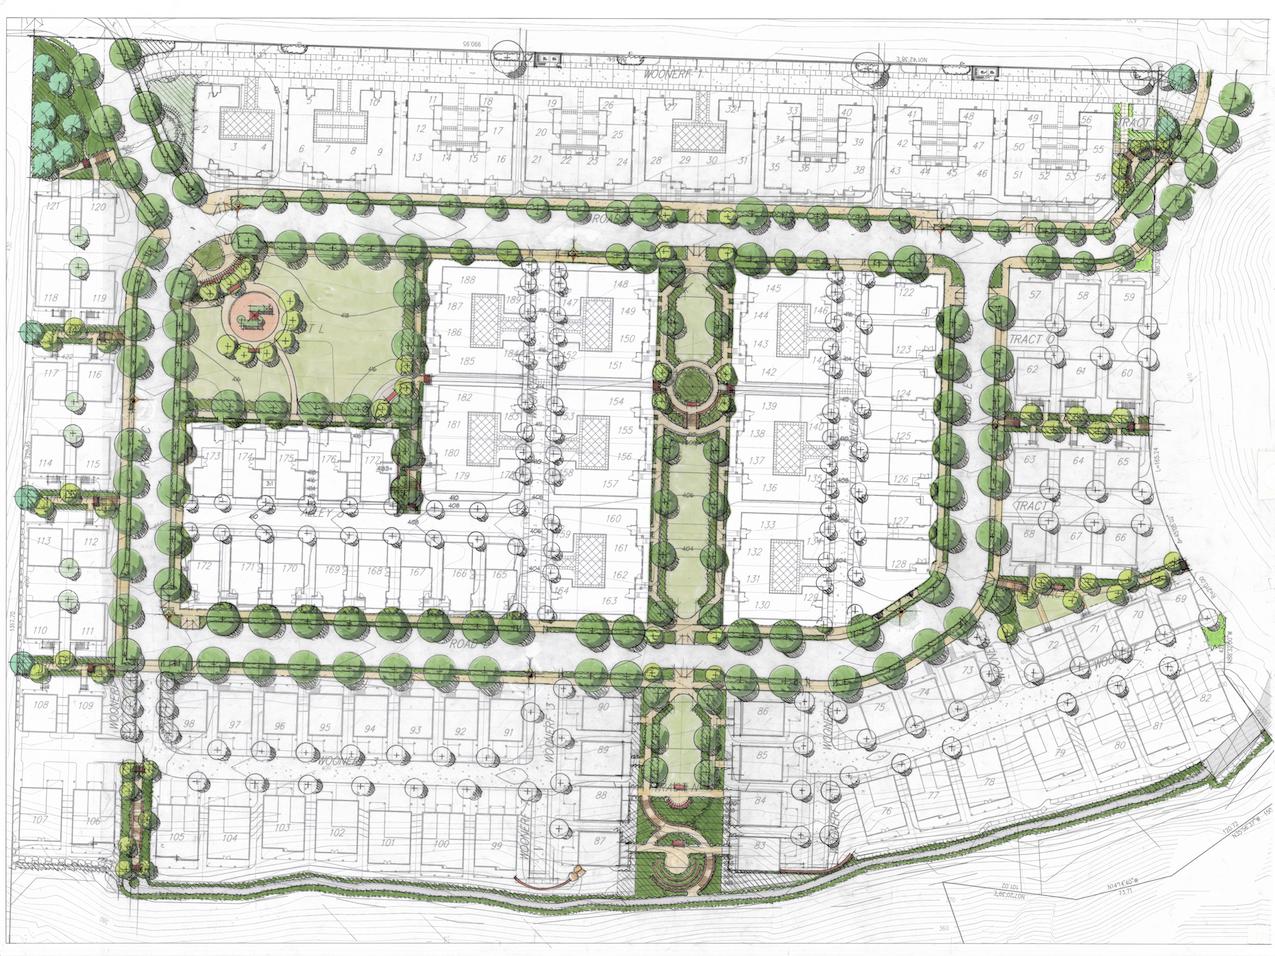 West highlands park site and landscape plan fred glick for Site plan with landscape